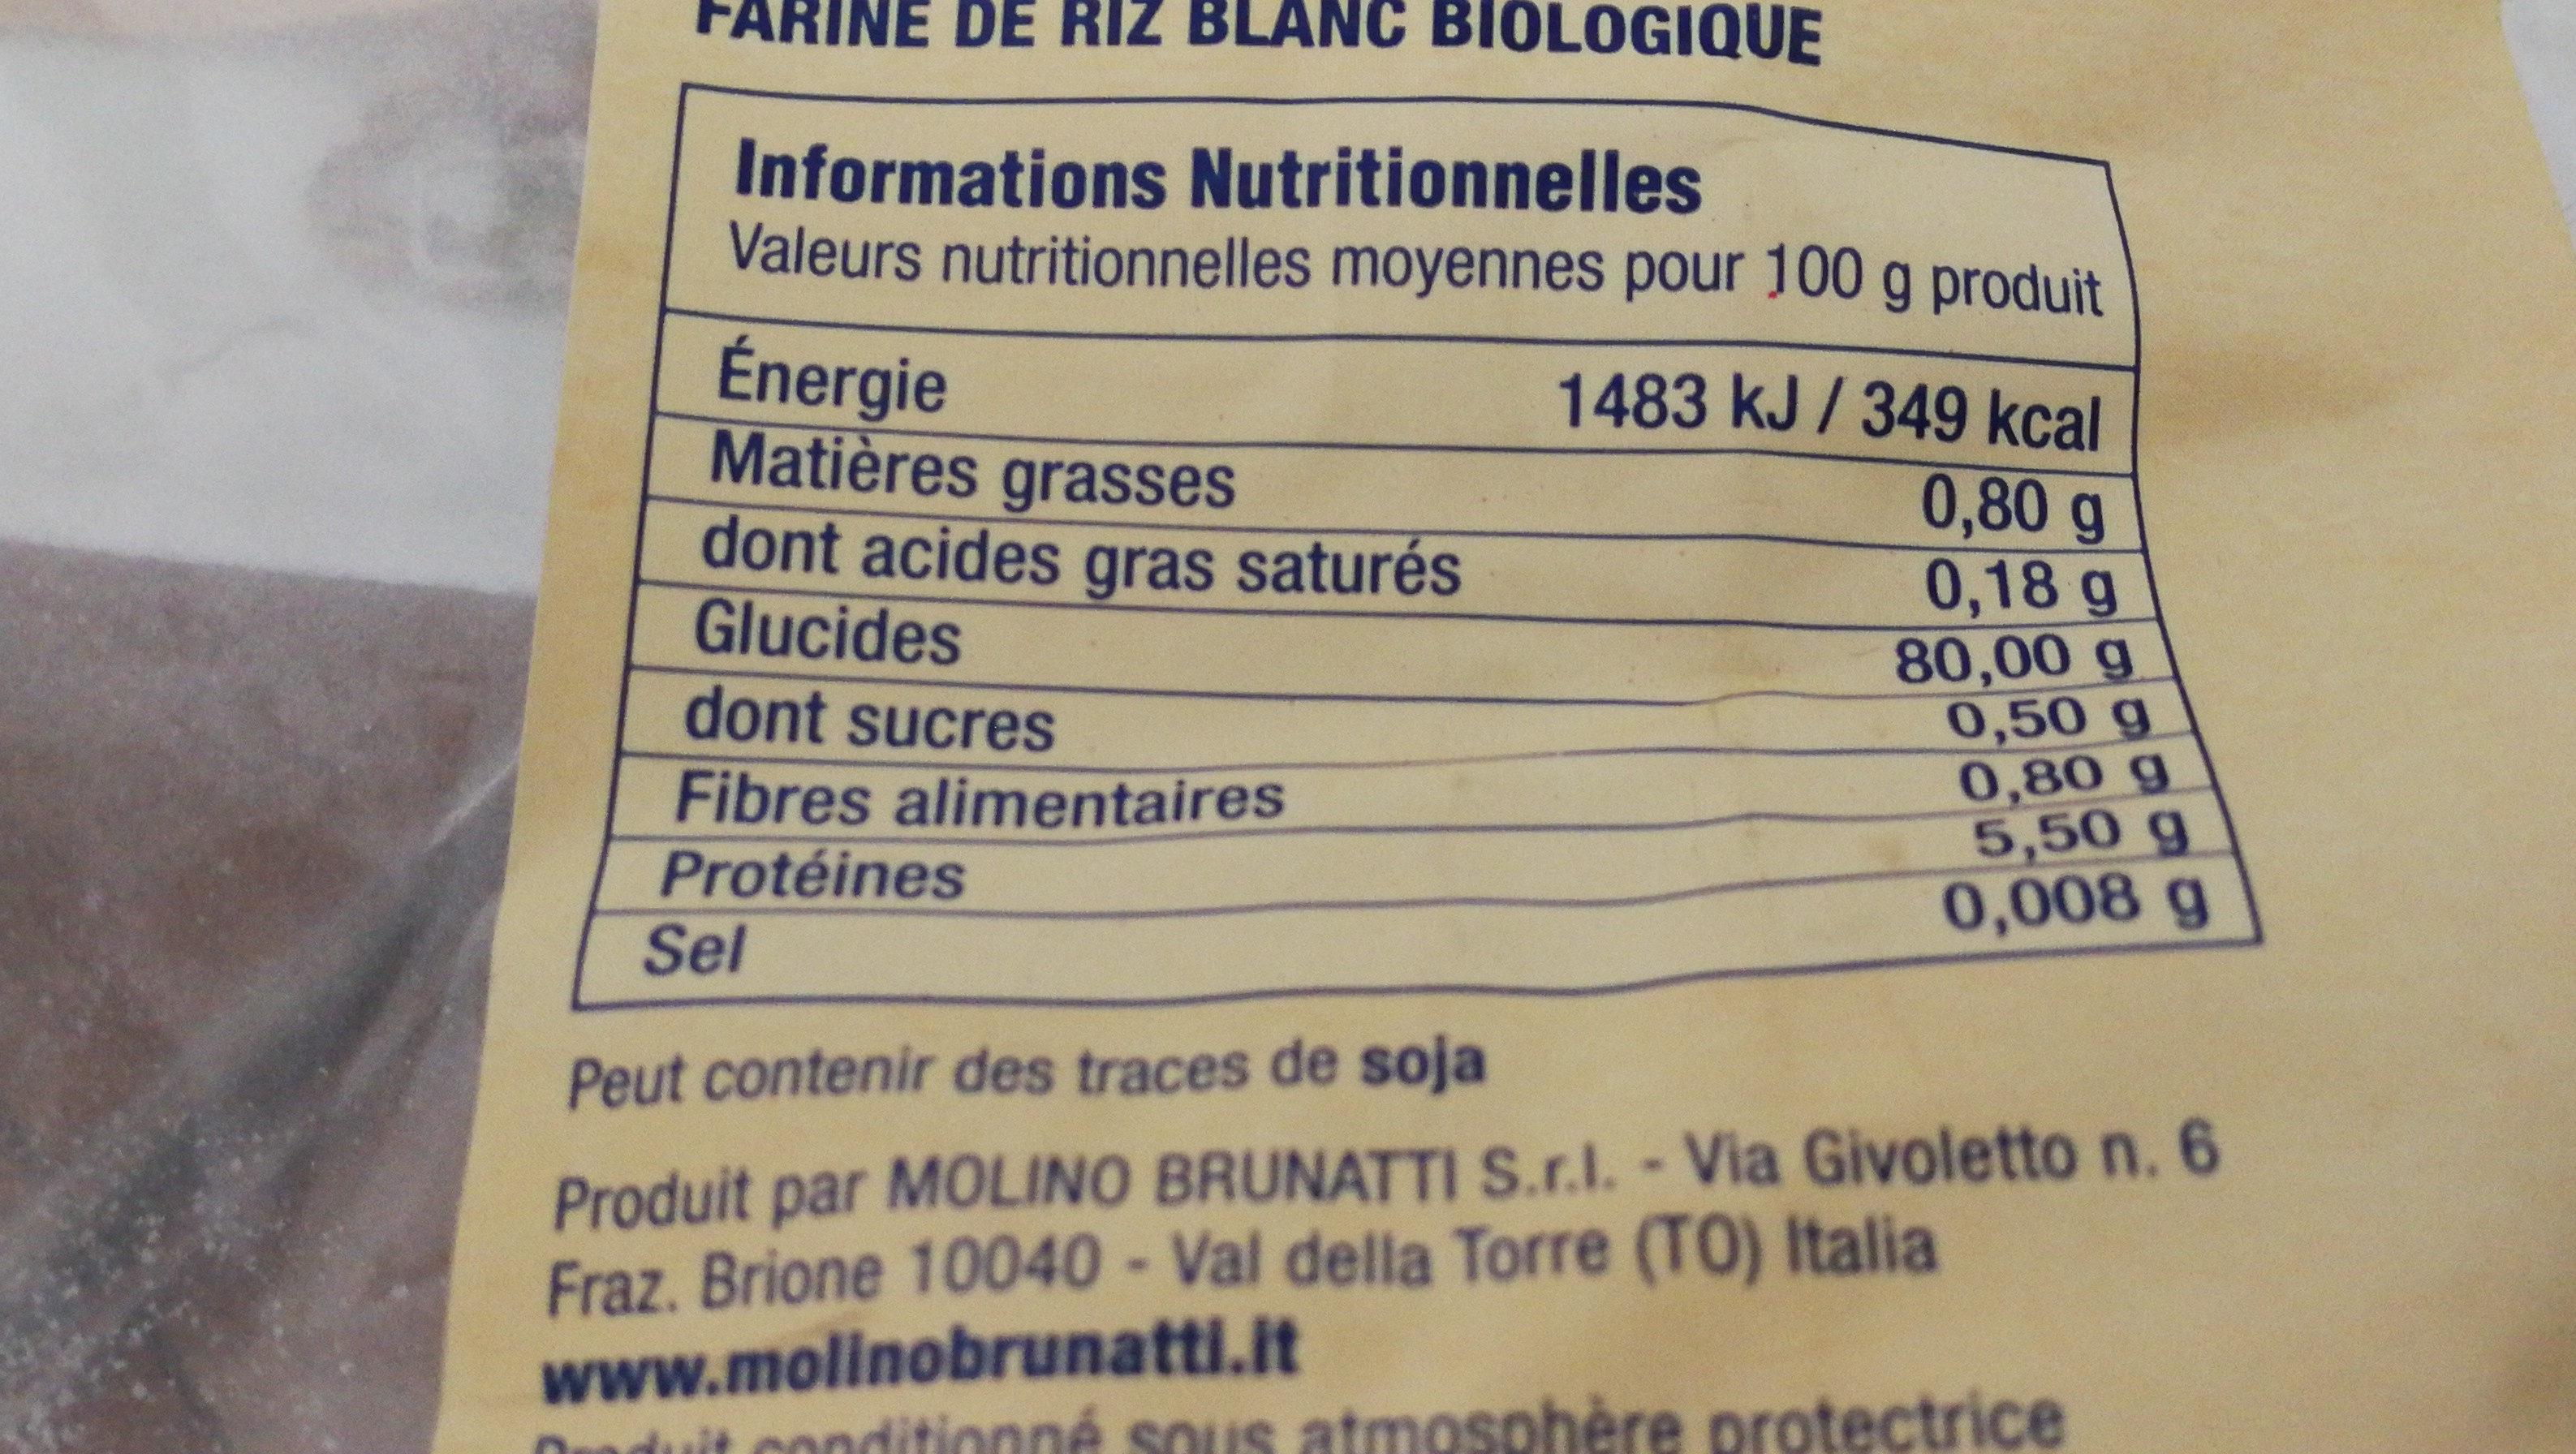 Farine riz blanc biologique - Ingrédients - fr